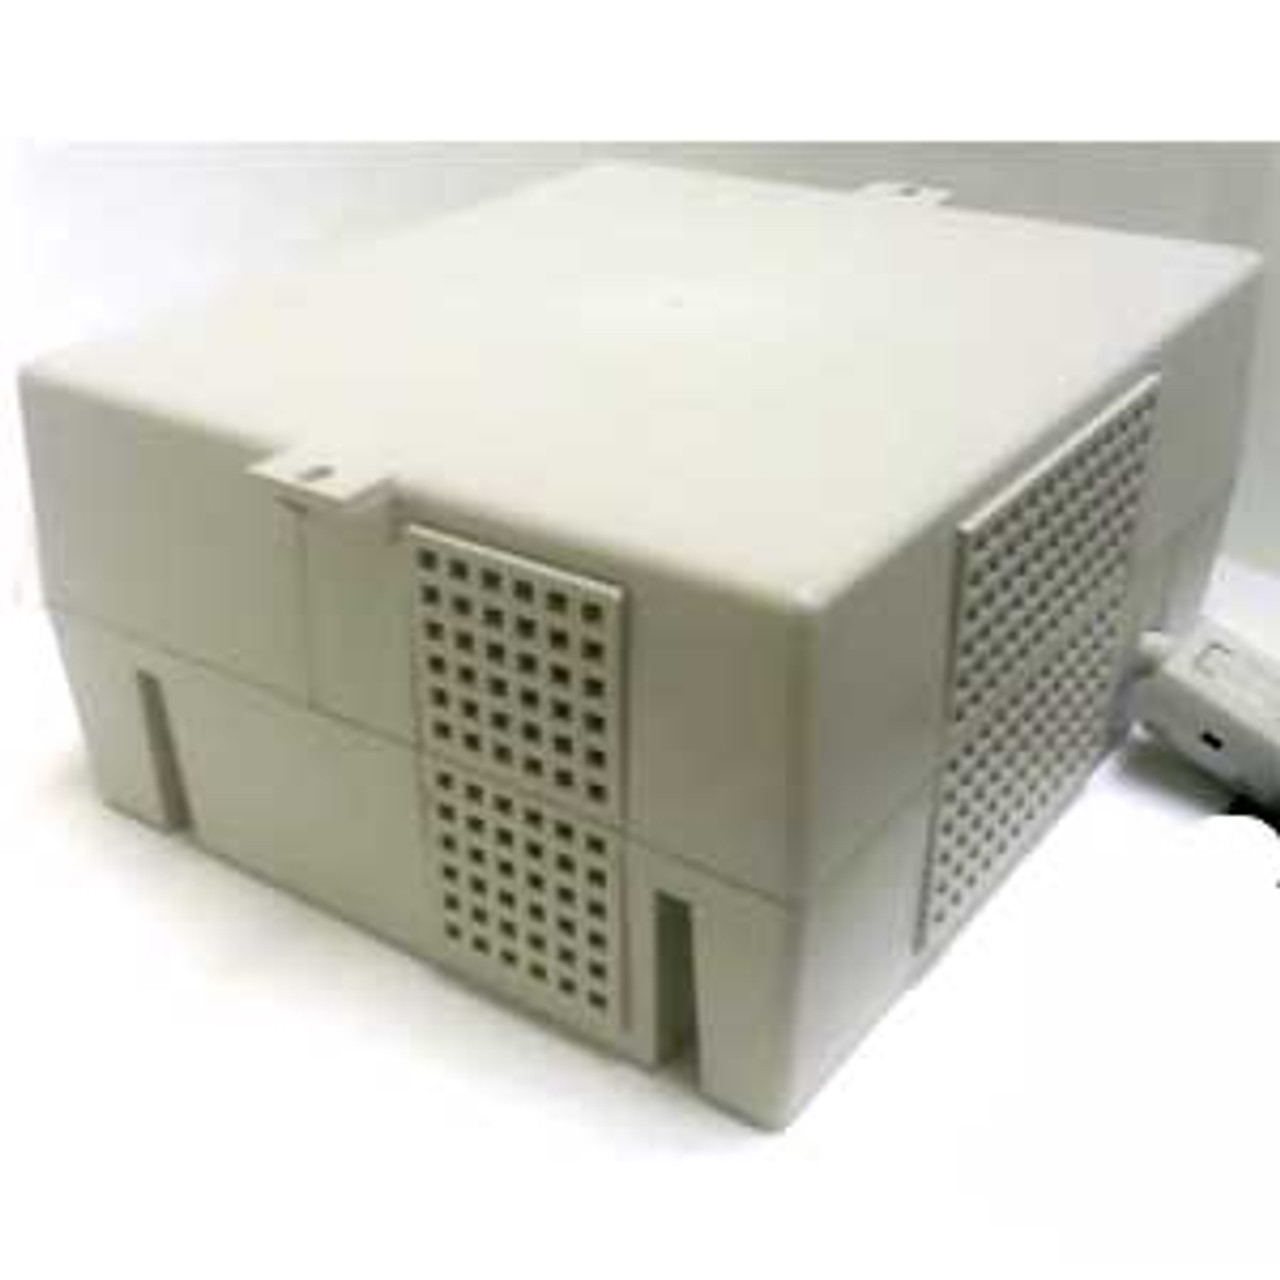 Sun Skynet DC Power Supply Unit (9150) for X4500